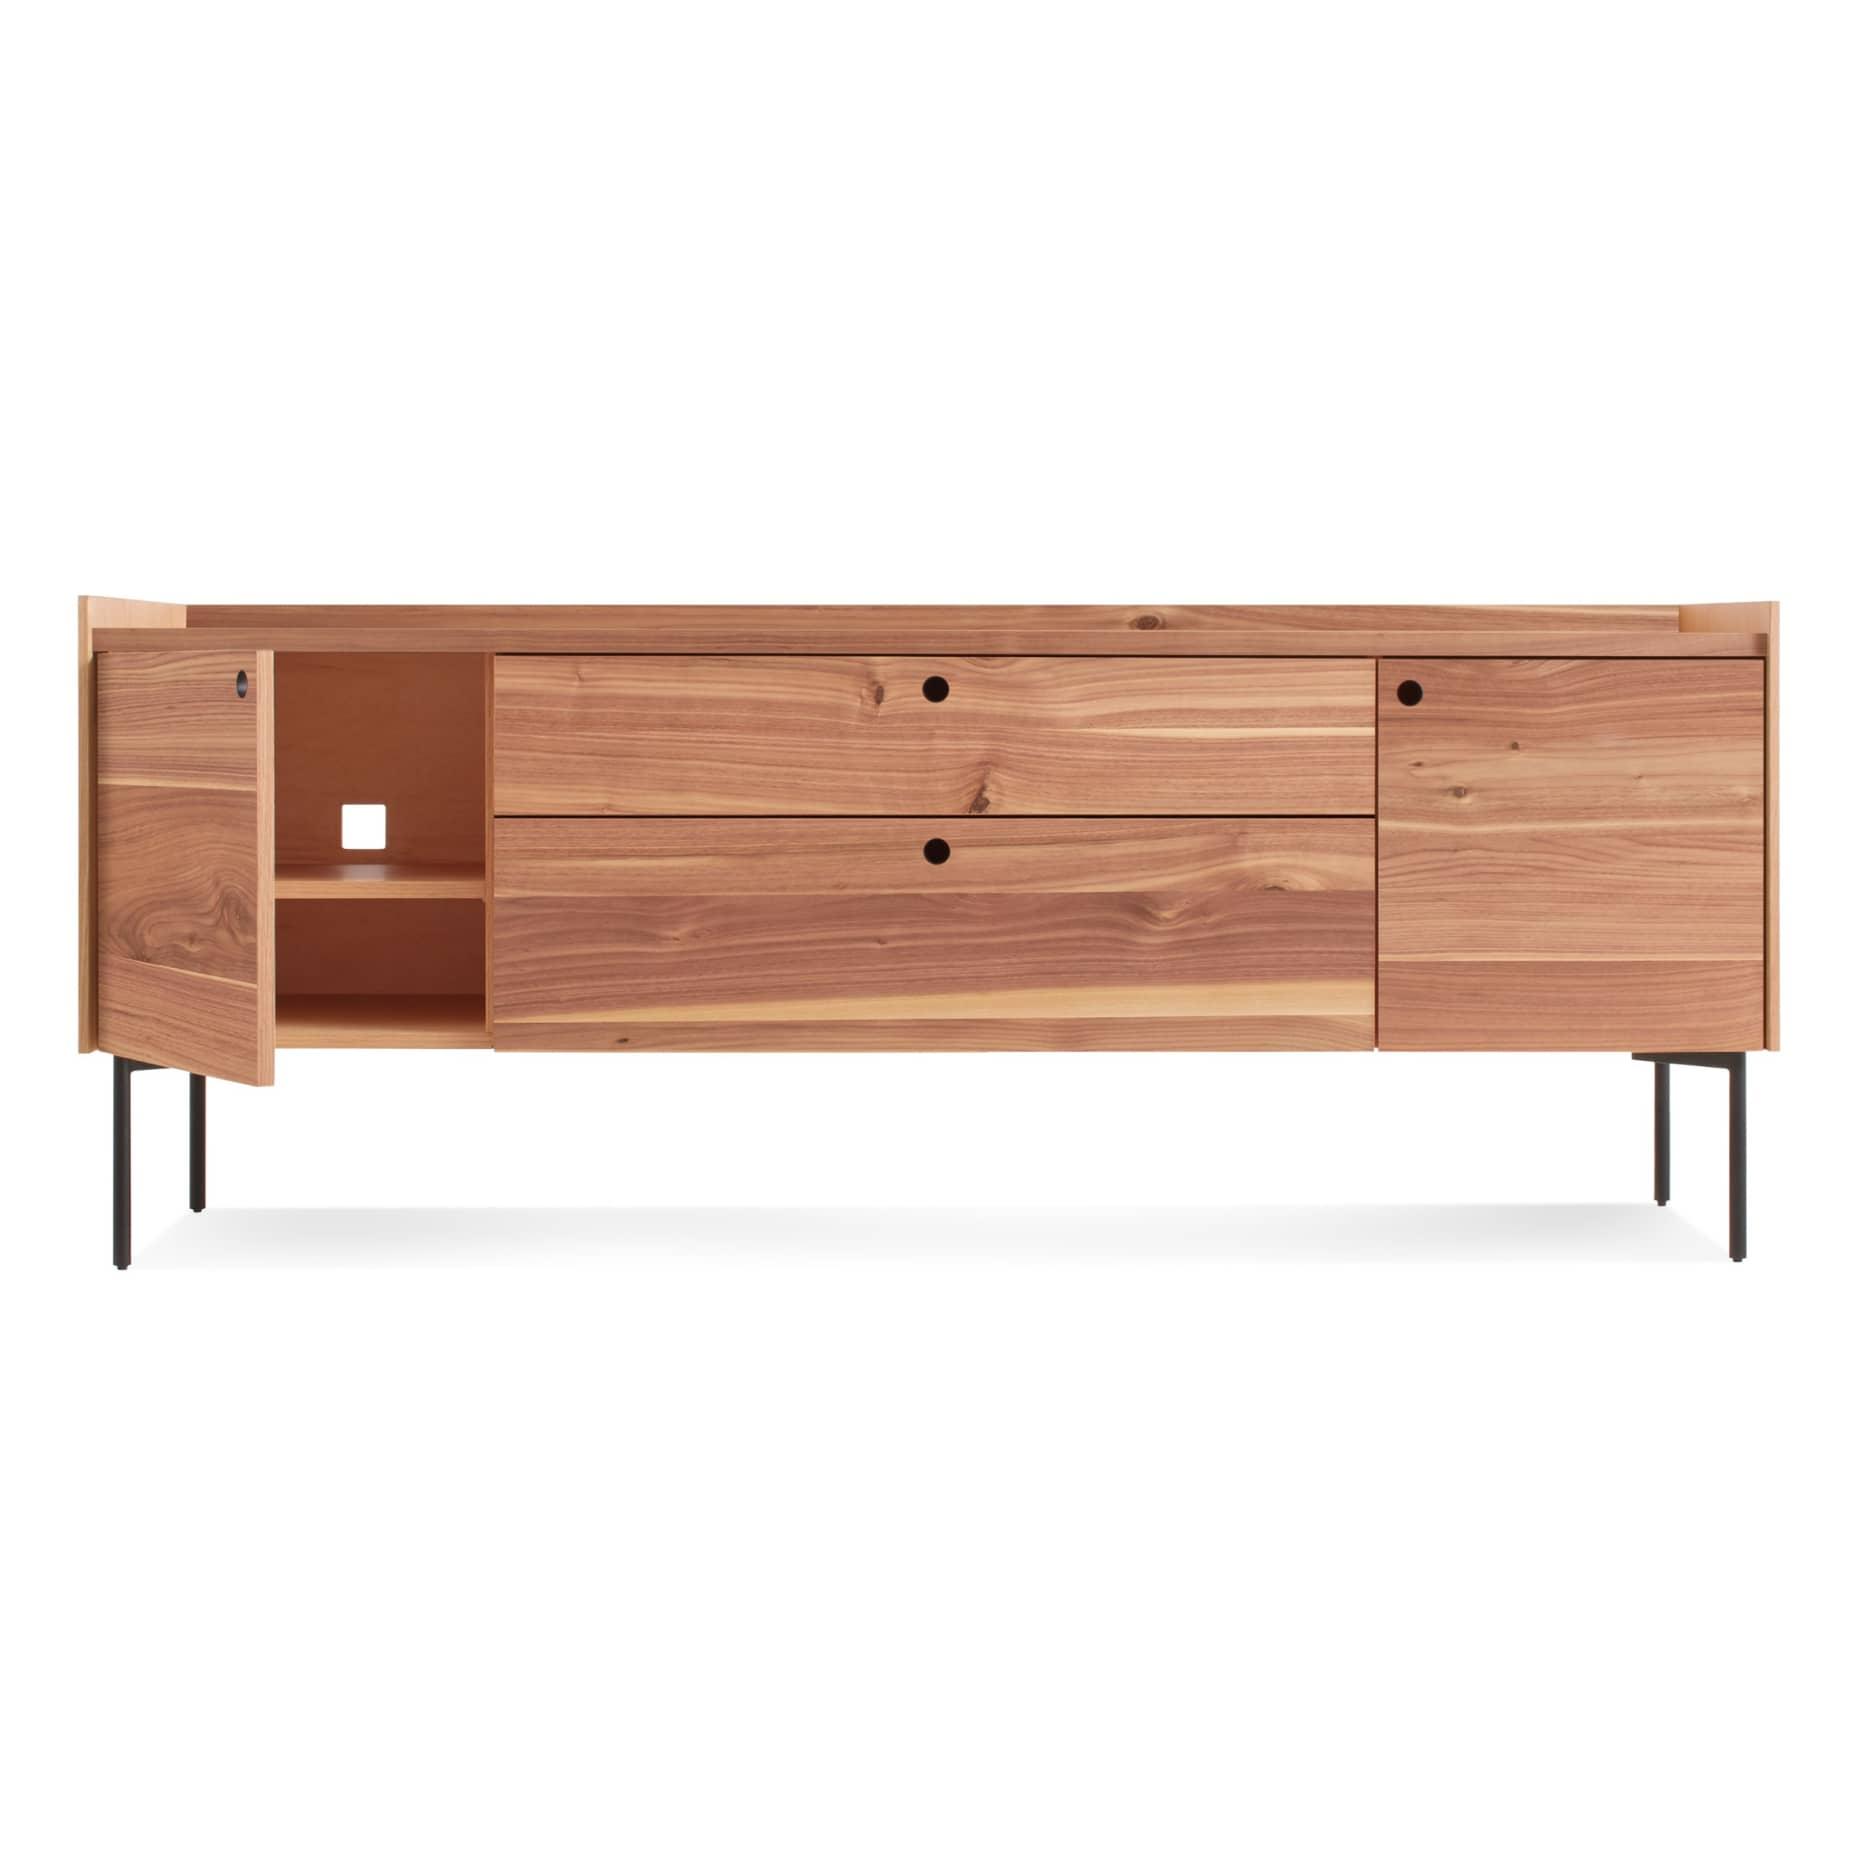 ek1 2d2drw wl open peek 2 door 2 drawer console rustic walnut 1